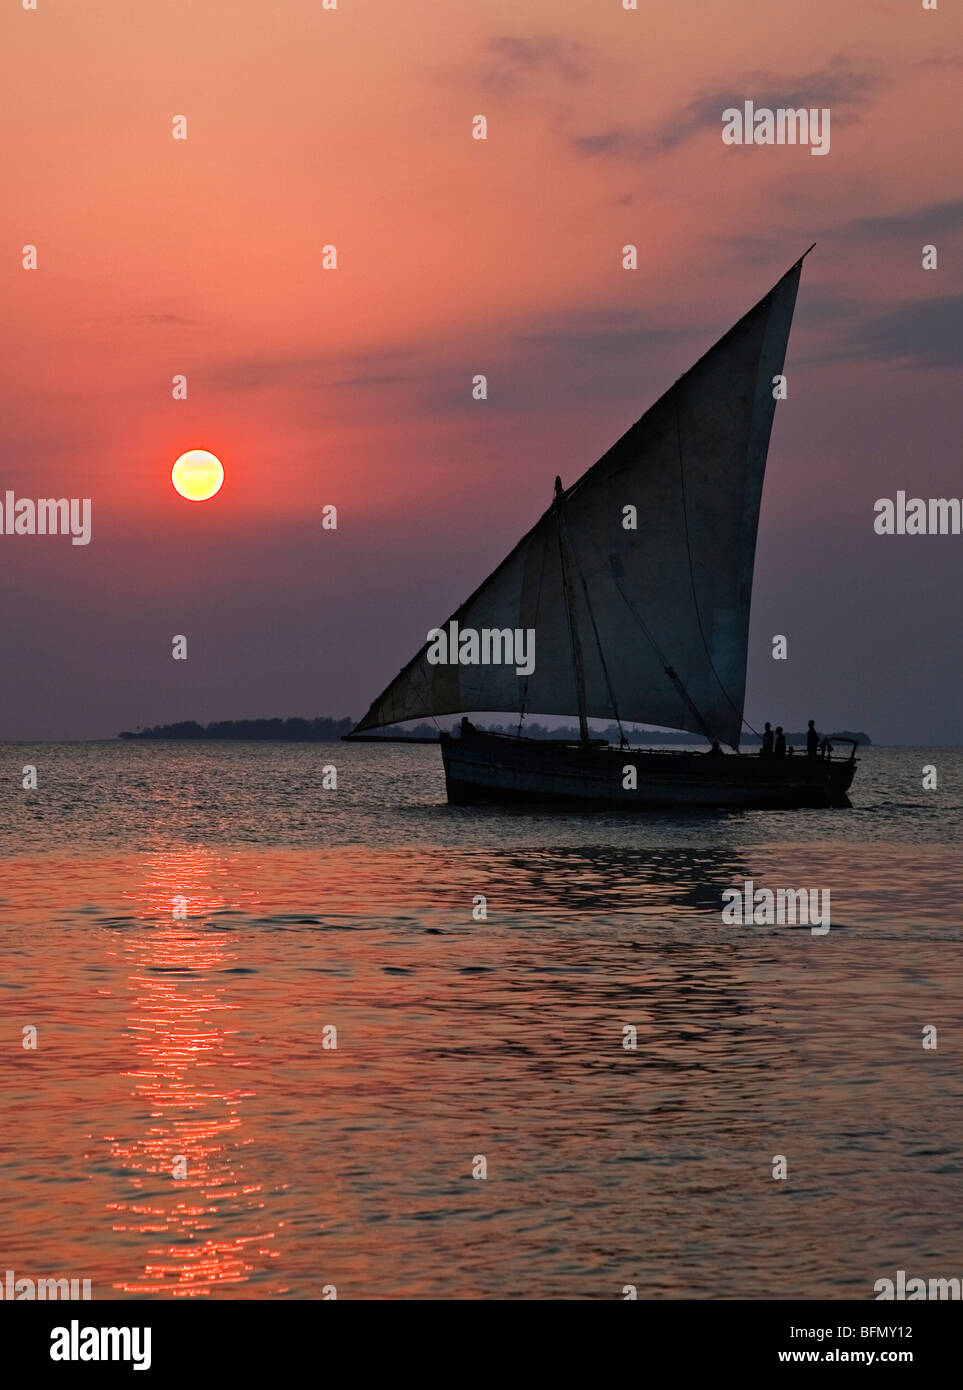 Tanzania, Zanzibar. A dhow sails back to Zanzibar harbour at sunset. - Stock Image